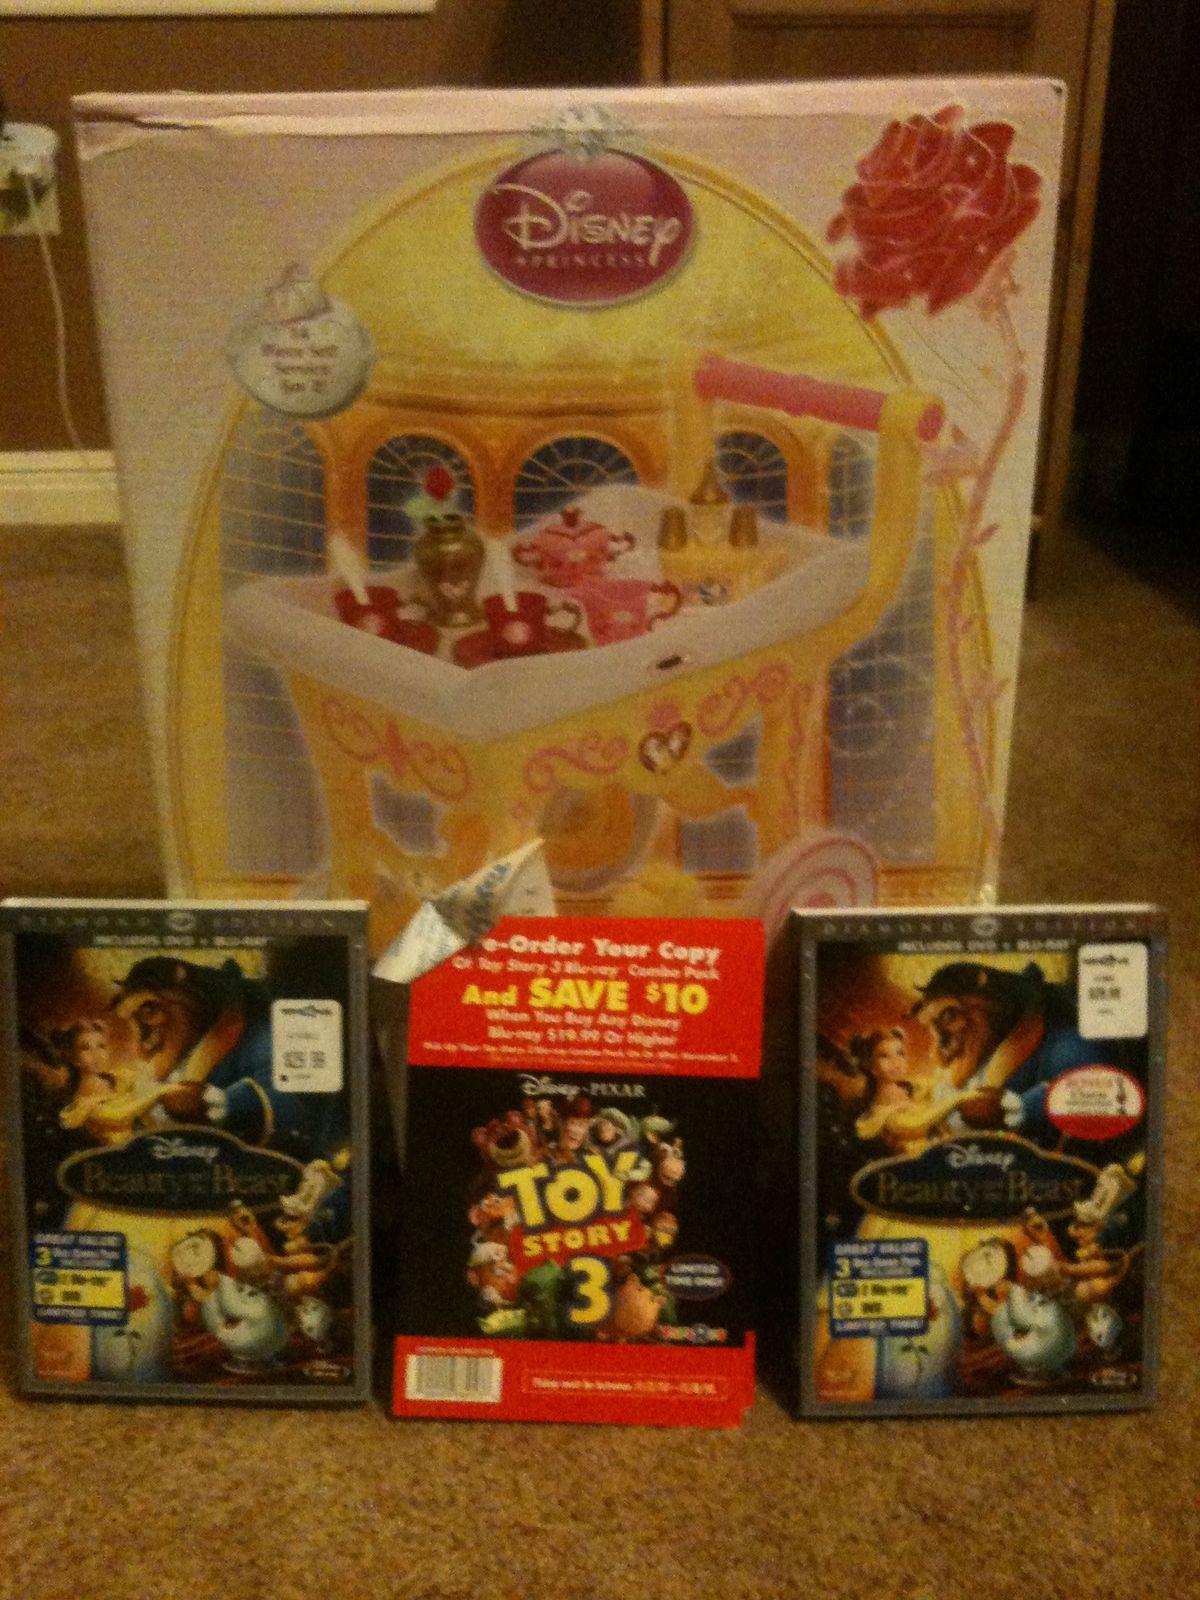 Toys R Us Dvd : Texa aver deal alert toys r us beauty and the beast dvd